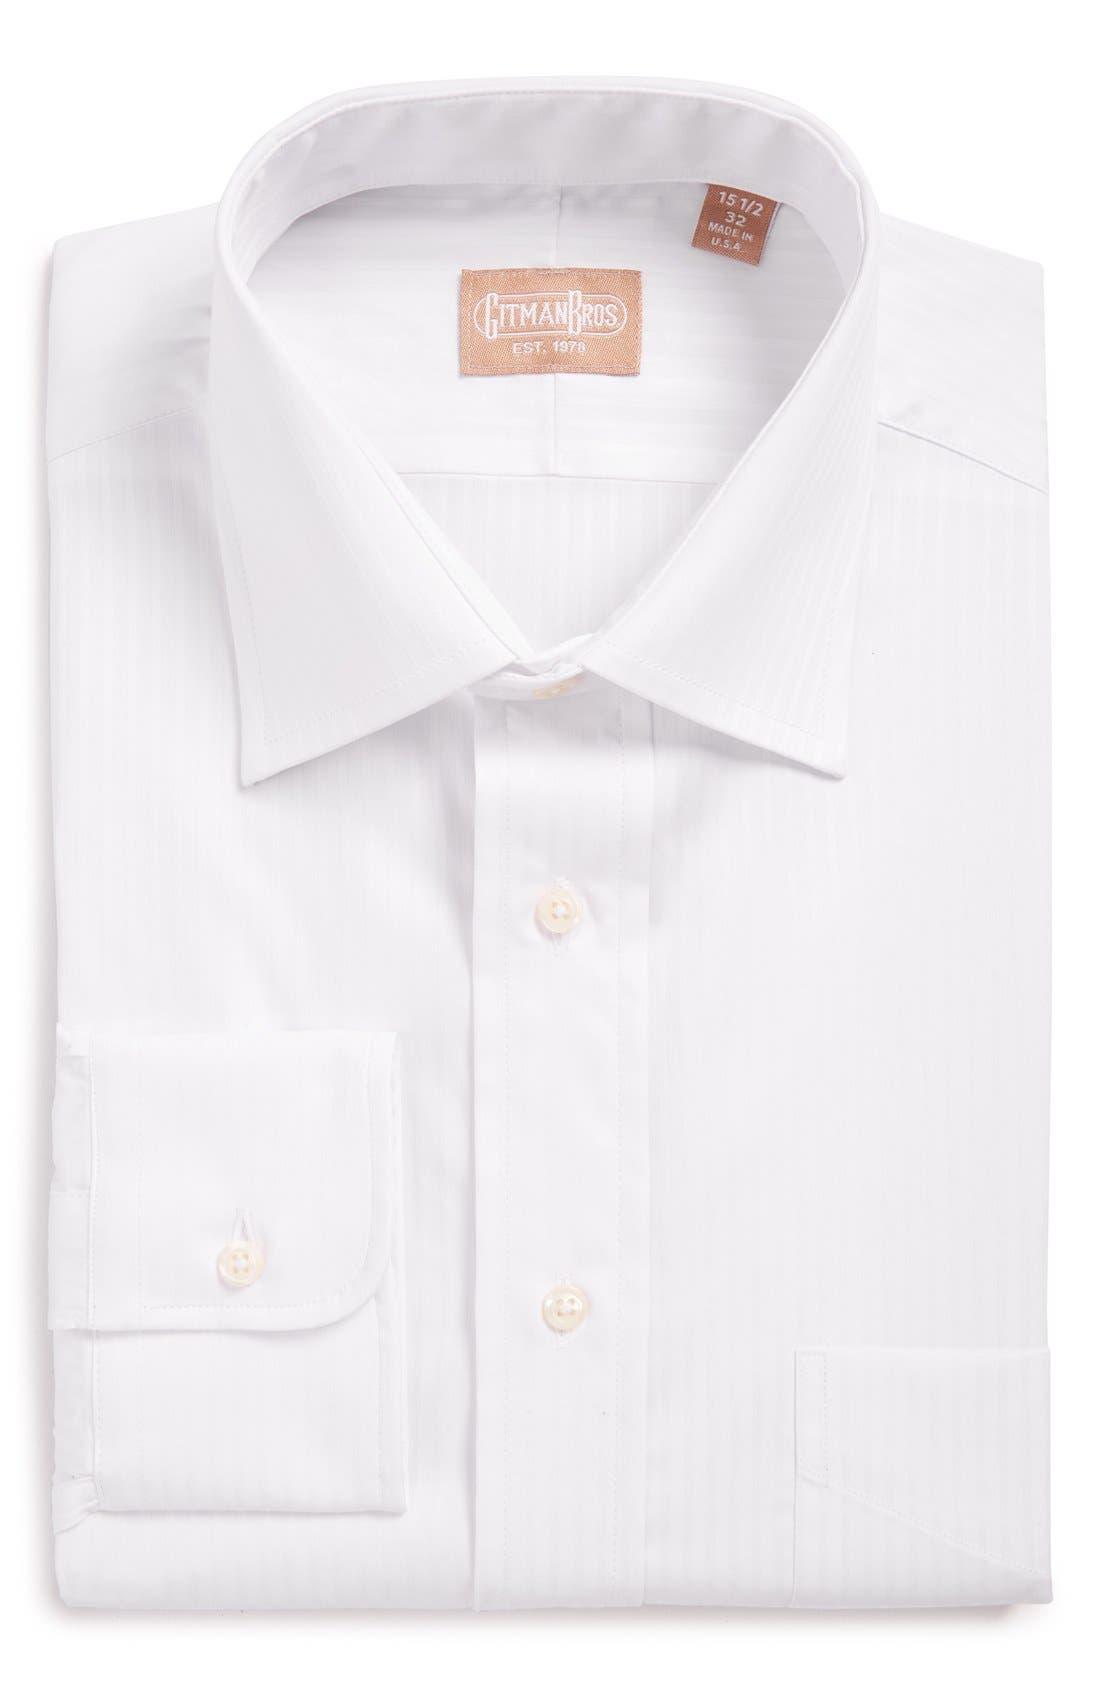 Regular Fit Tonal Stripe Twill Dress Shirt,                         Main,                         color, White